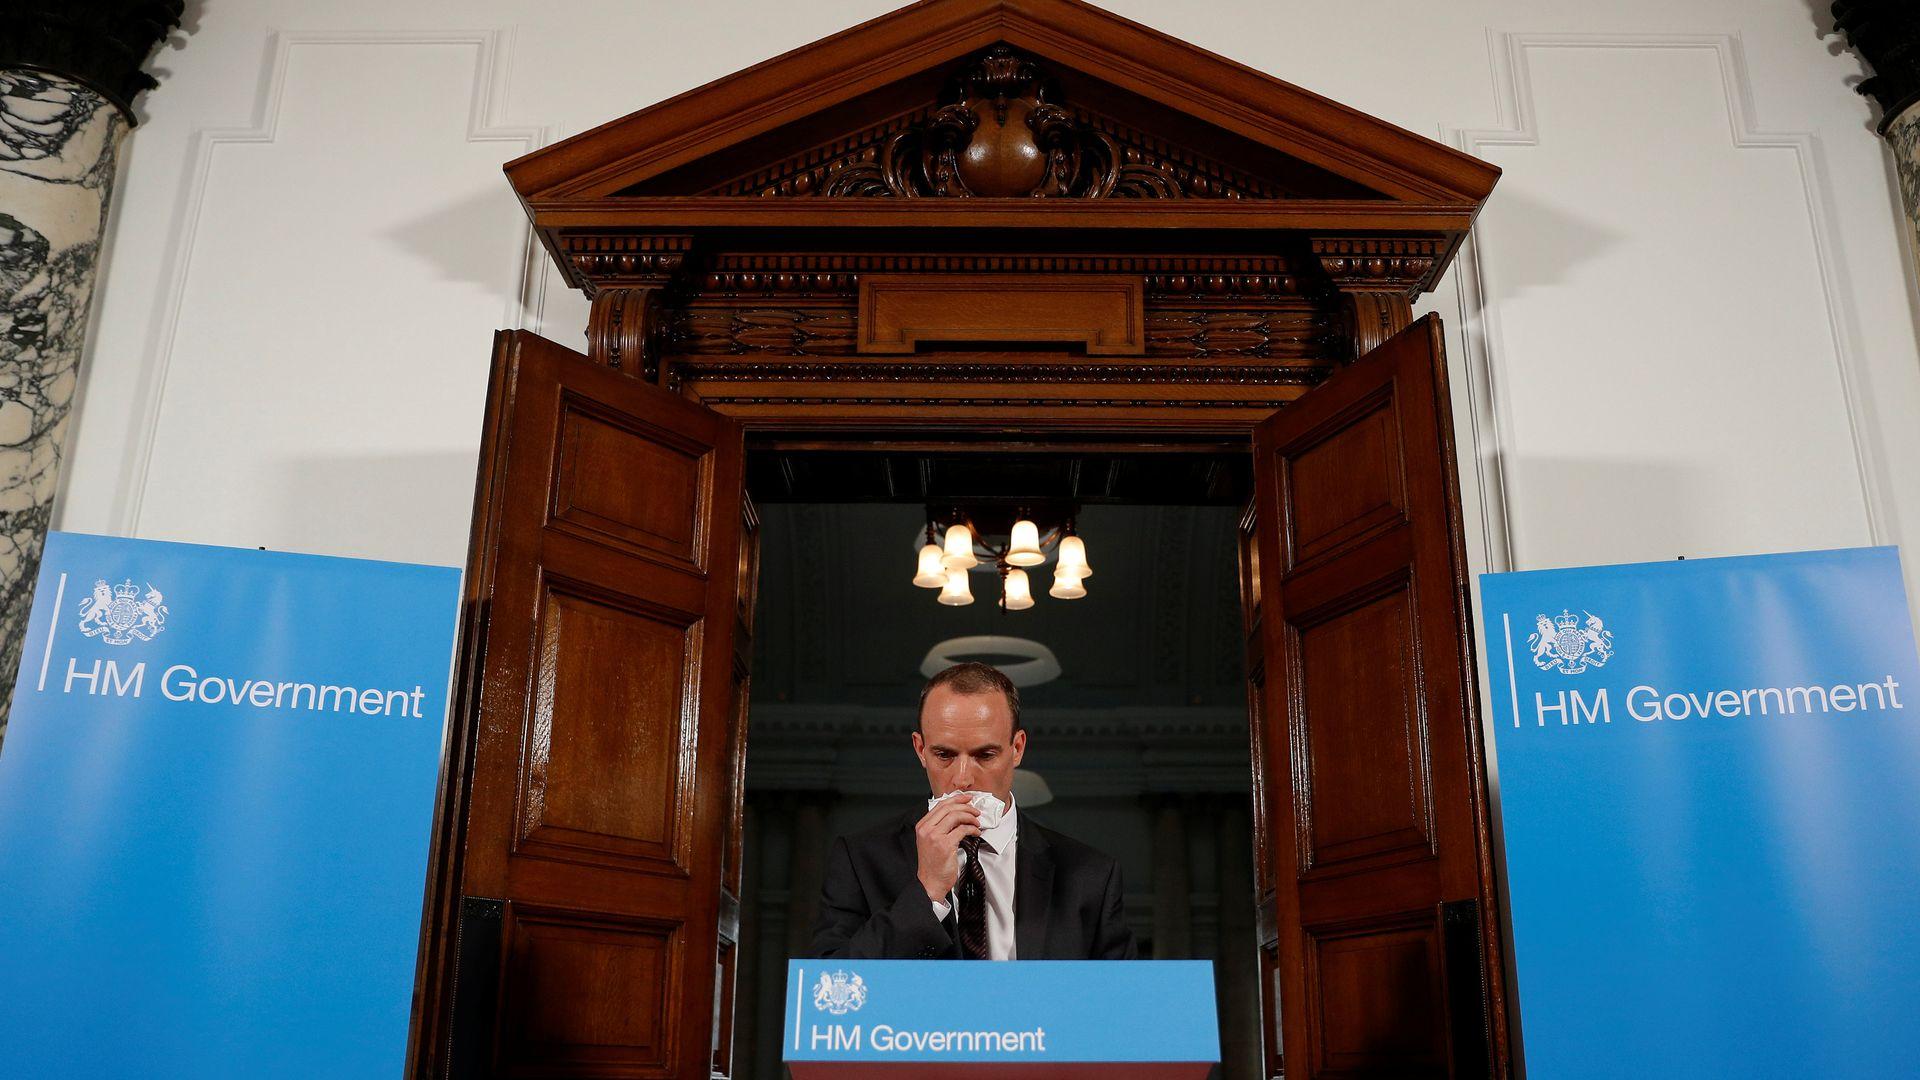 Brexit Secretary Dominic Raab. Photo: Peter Nicholls/AFP/Getty Images